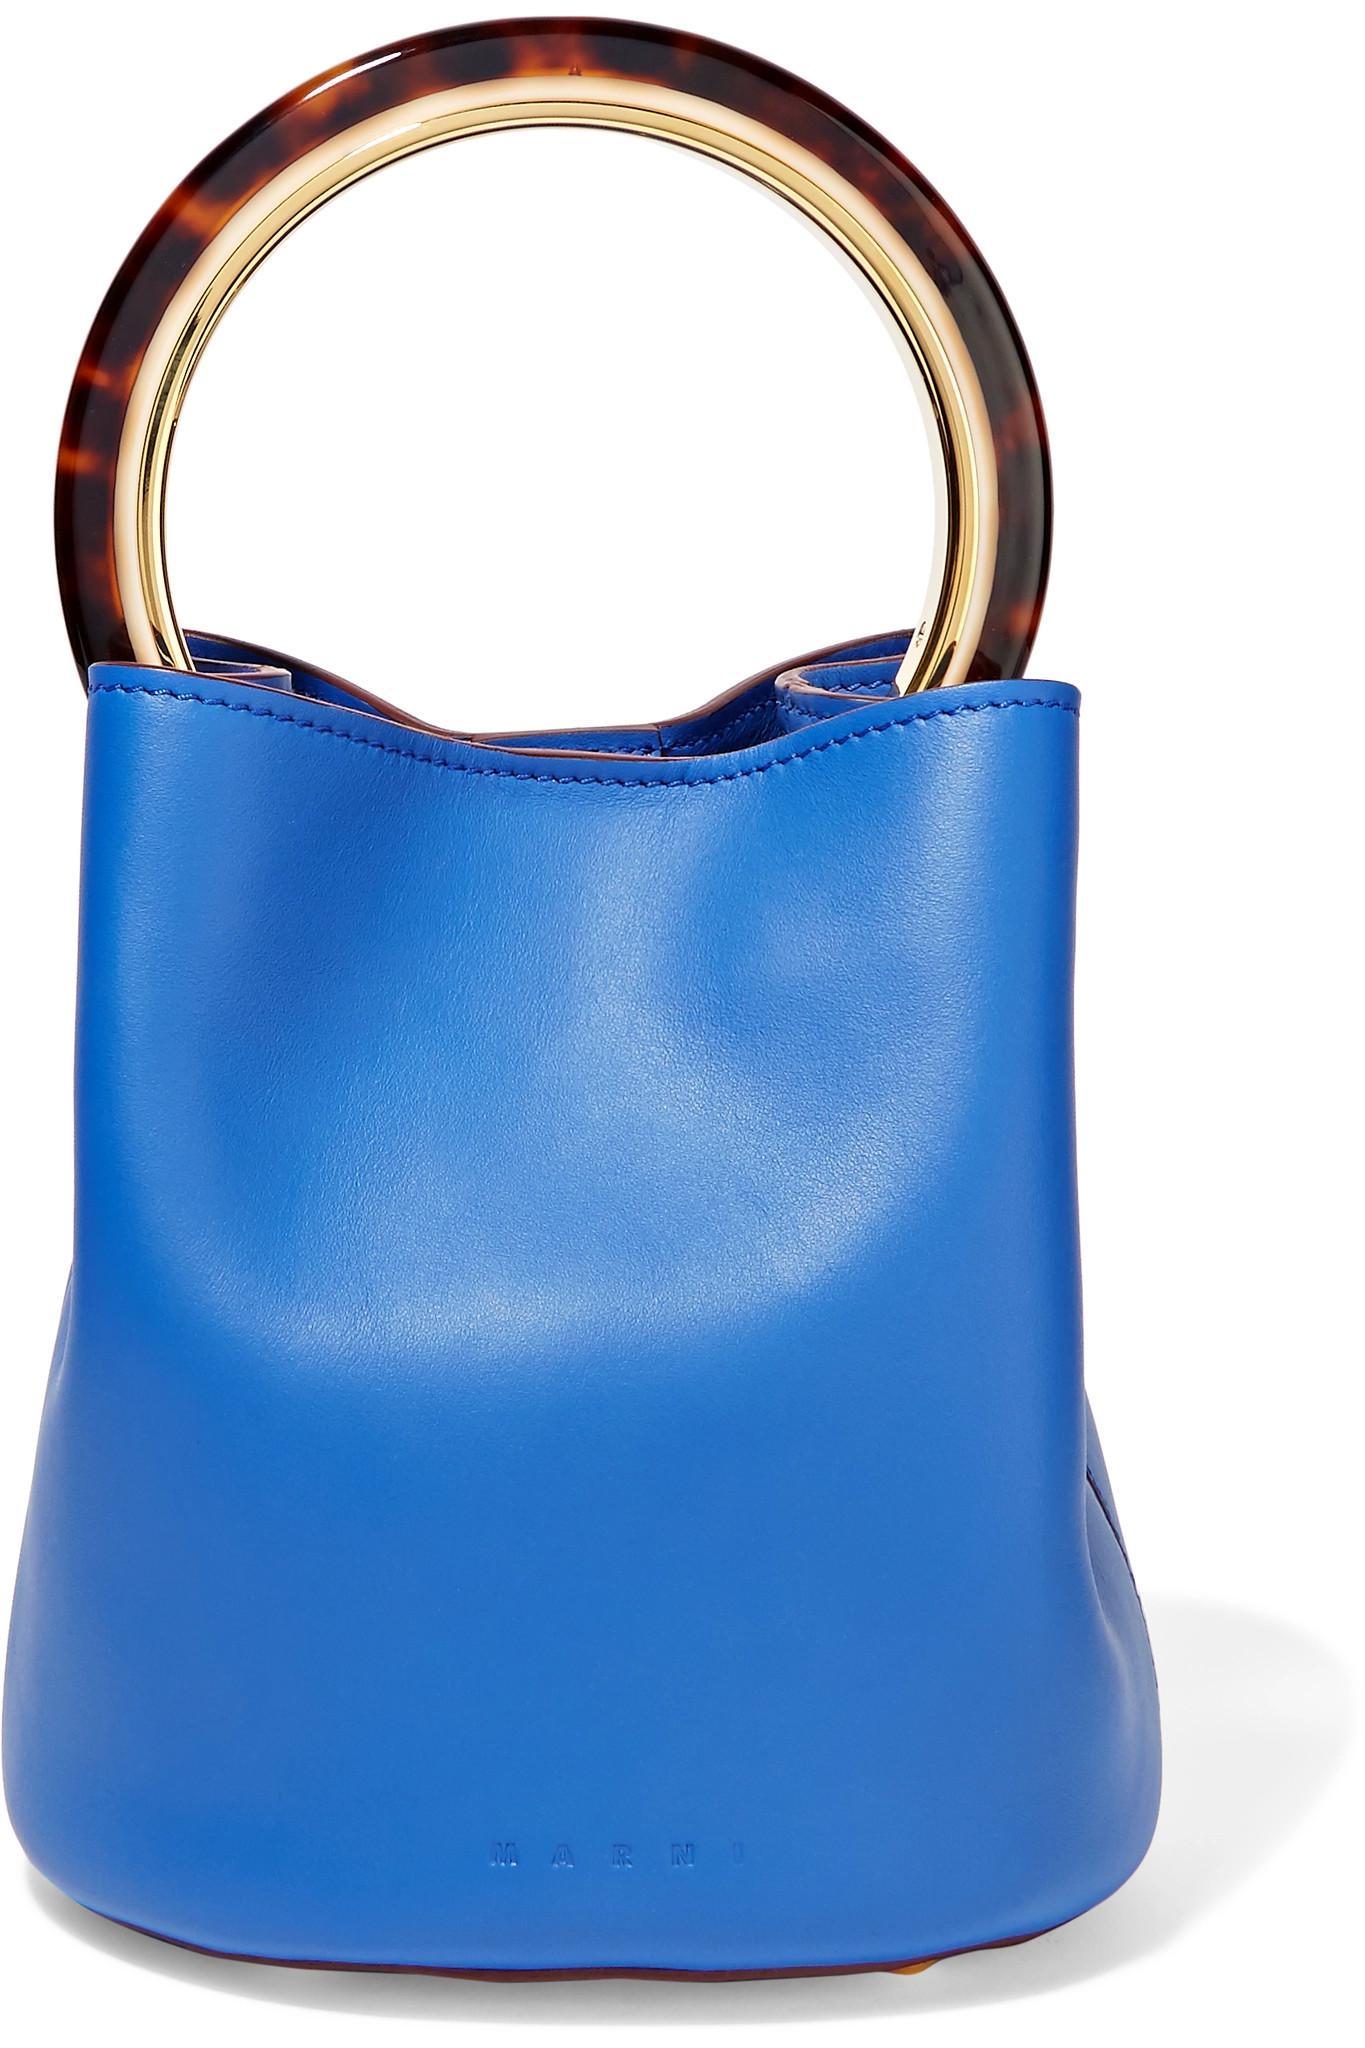 Pannier bag - Blue Marni P1fSw